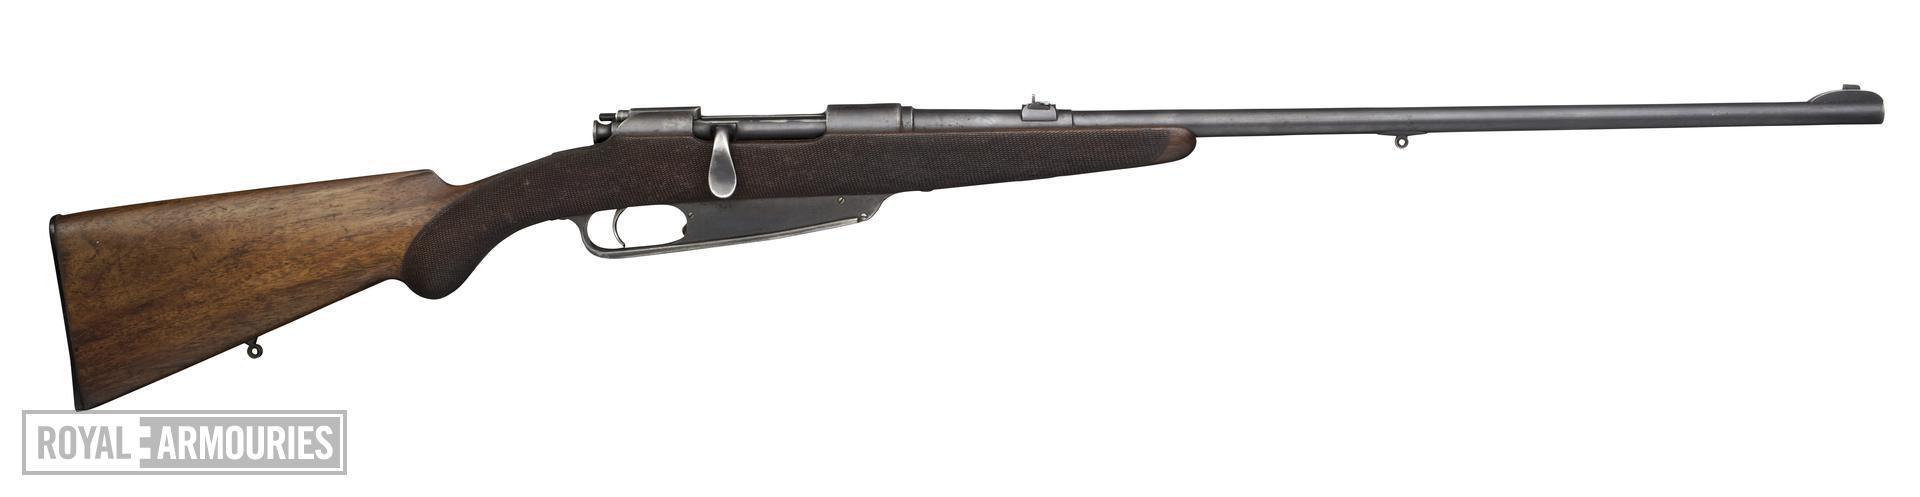 Centrefire bolt-action sporting rifle - Mauser Model 1848